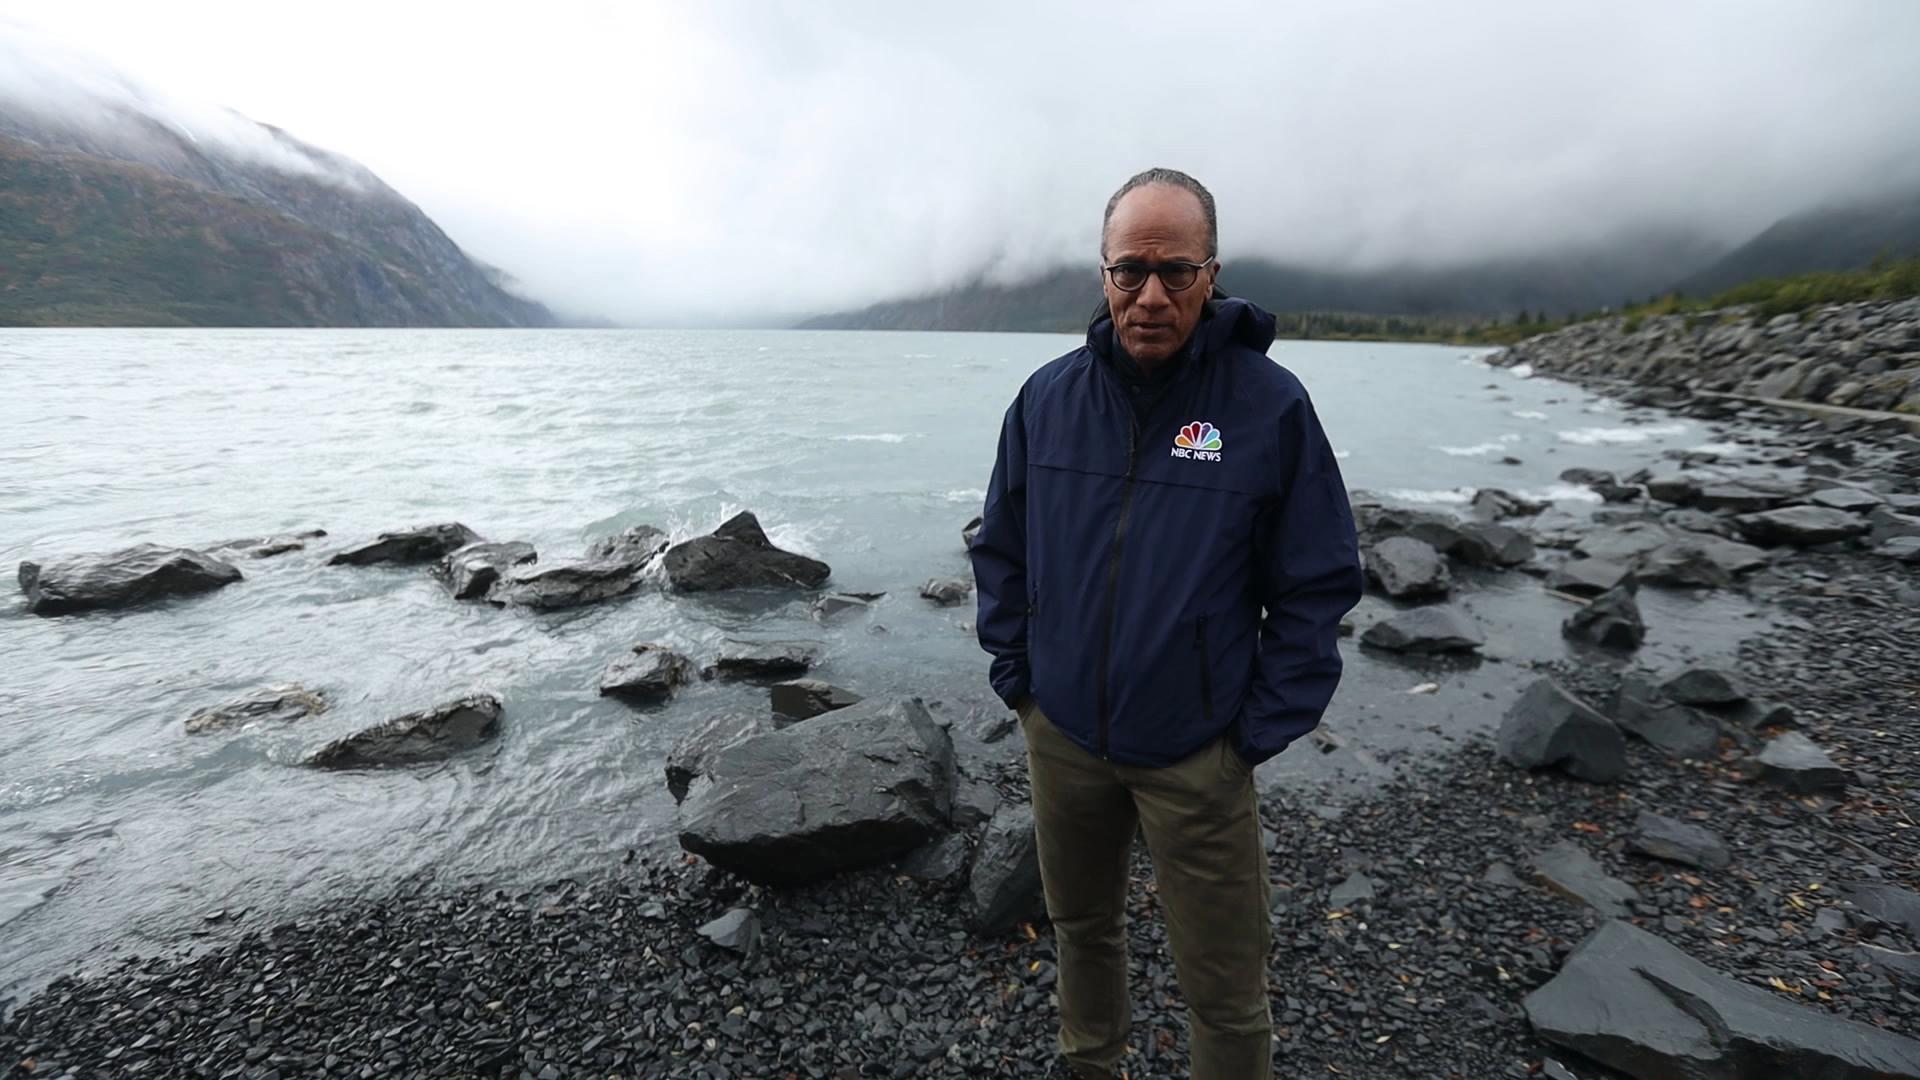 Climate in Crisis: Lester Holt's journey to Alaska